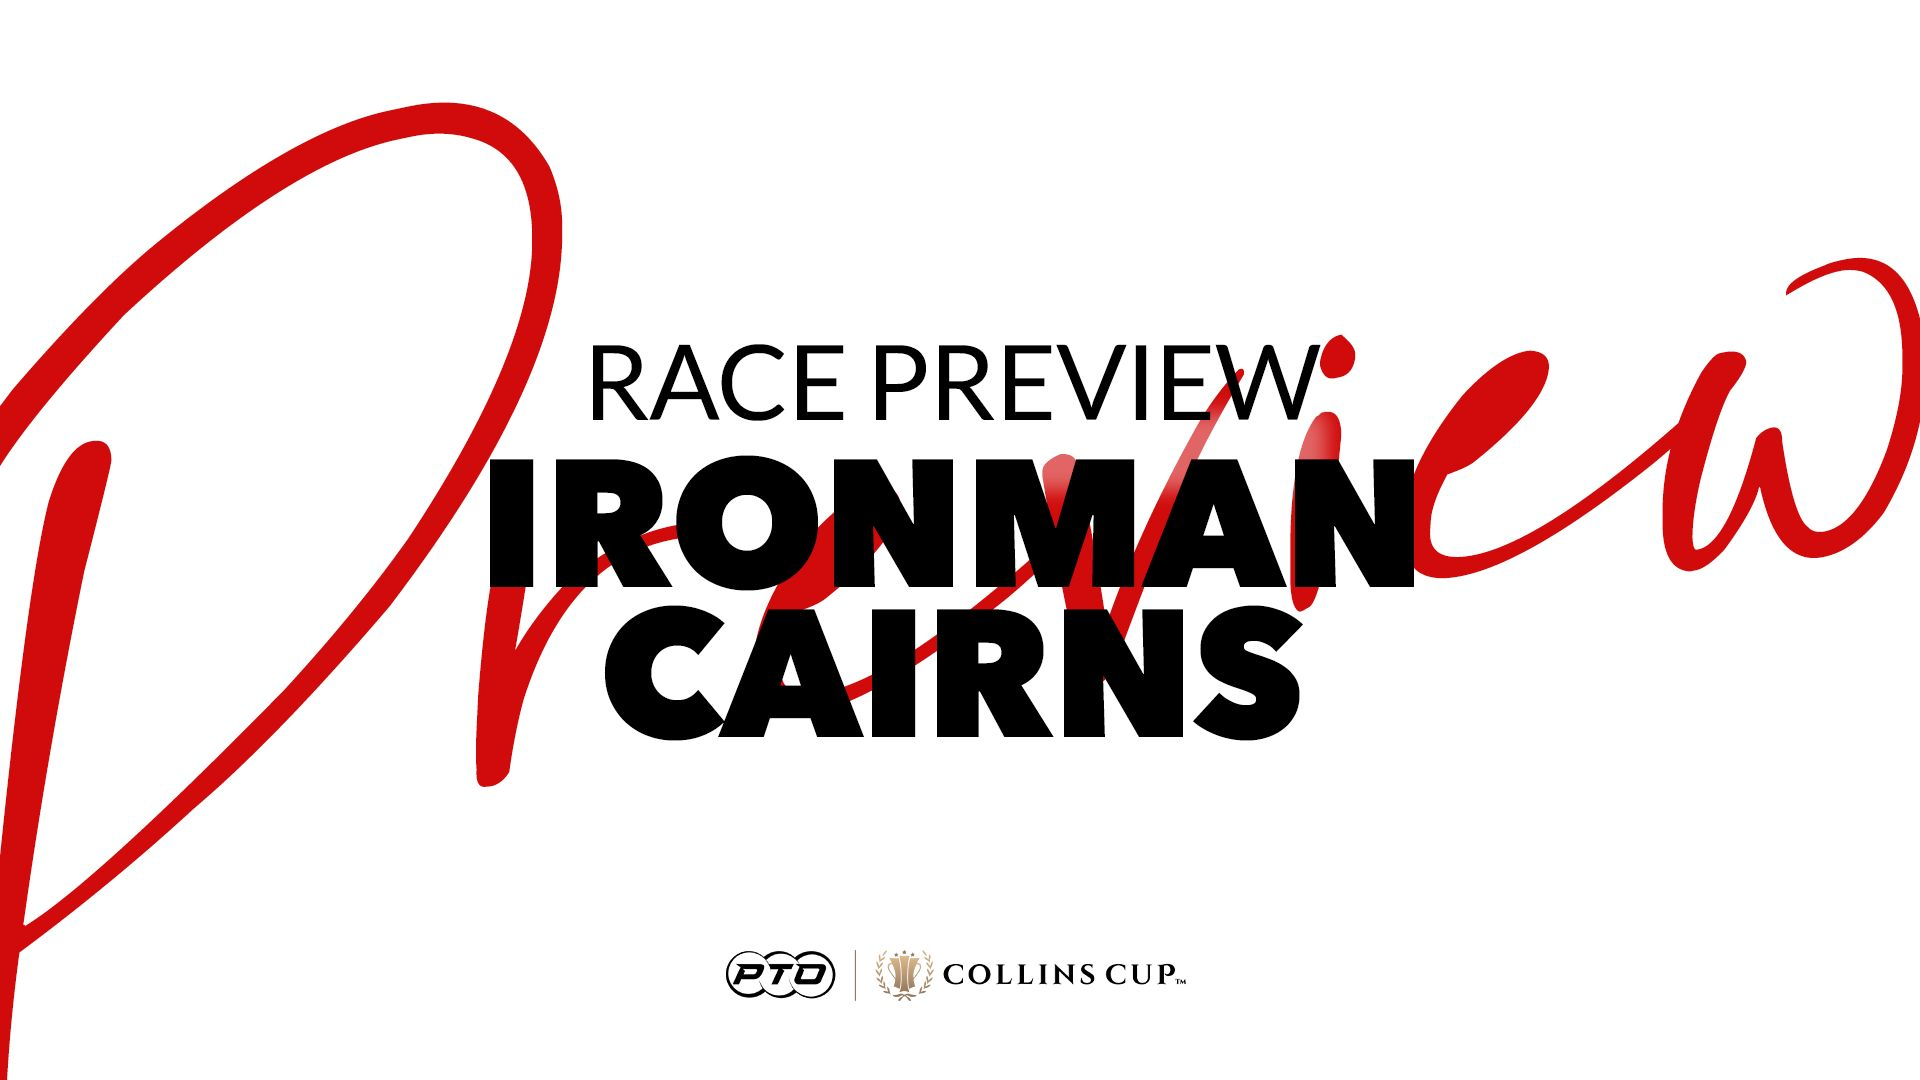 Race Preview: Ironman Cairns